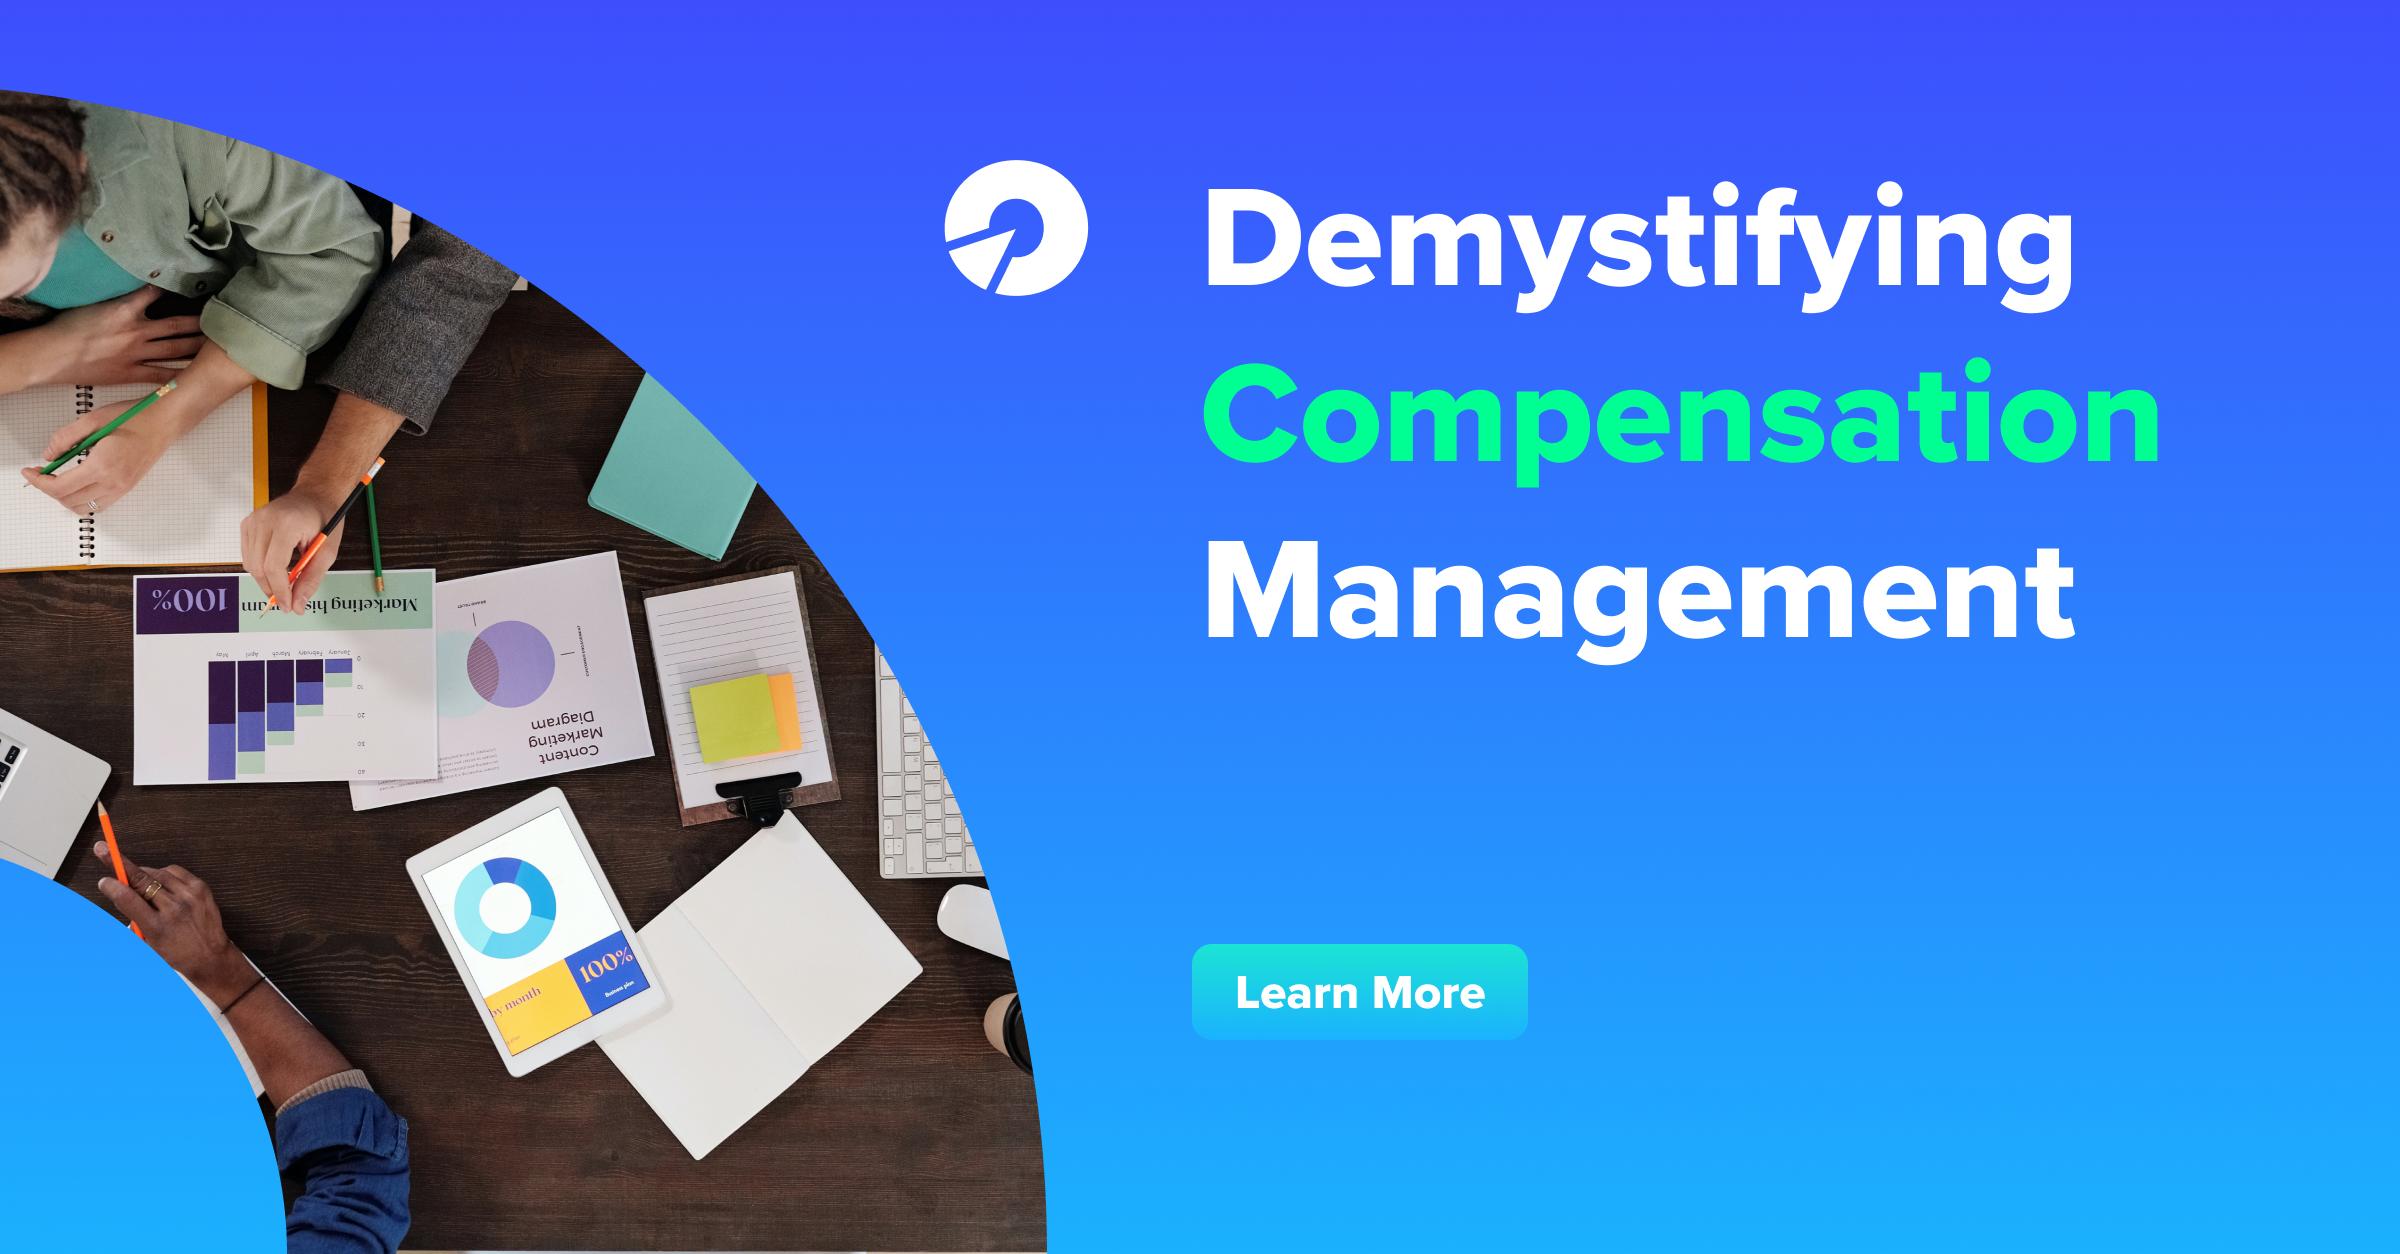 Demystifying Compensation Management